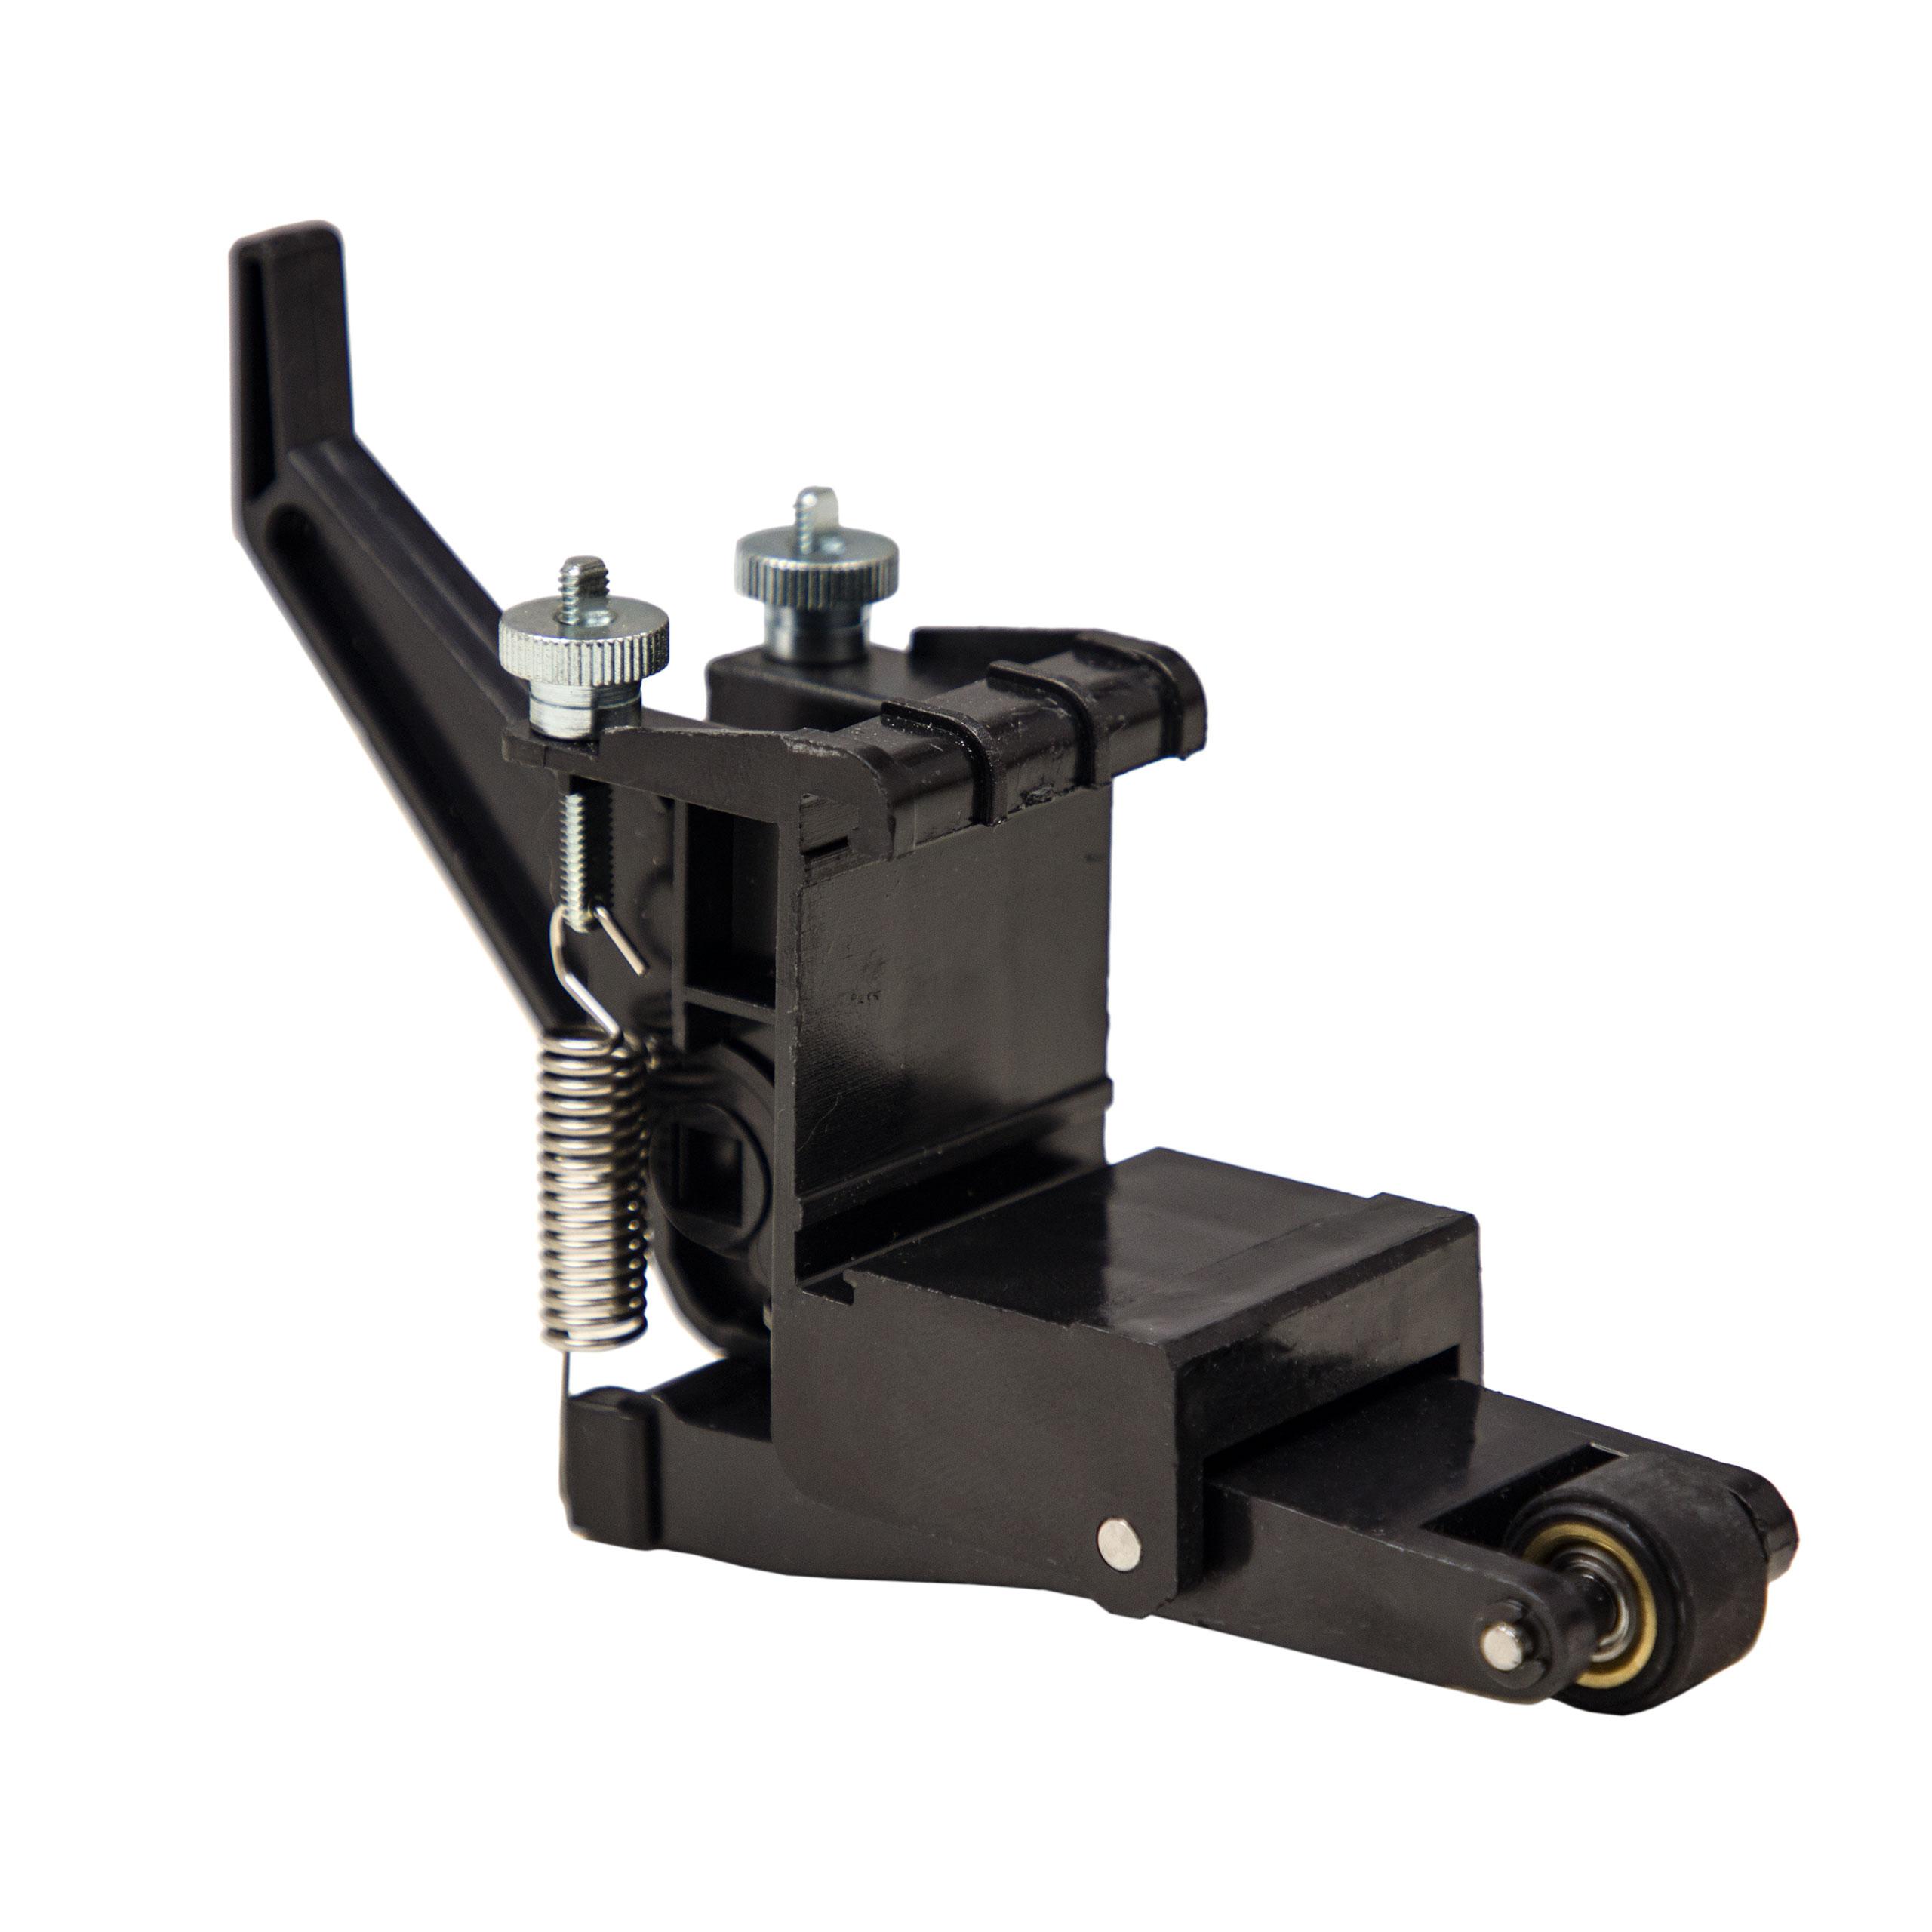 Folienhalter - Fixierhebel für HobbyCut TC-631, TC-801 und PowerCut DF-1261 Rollenhalter